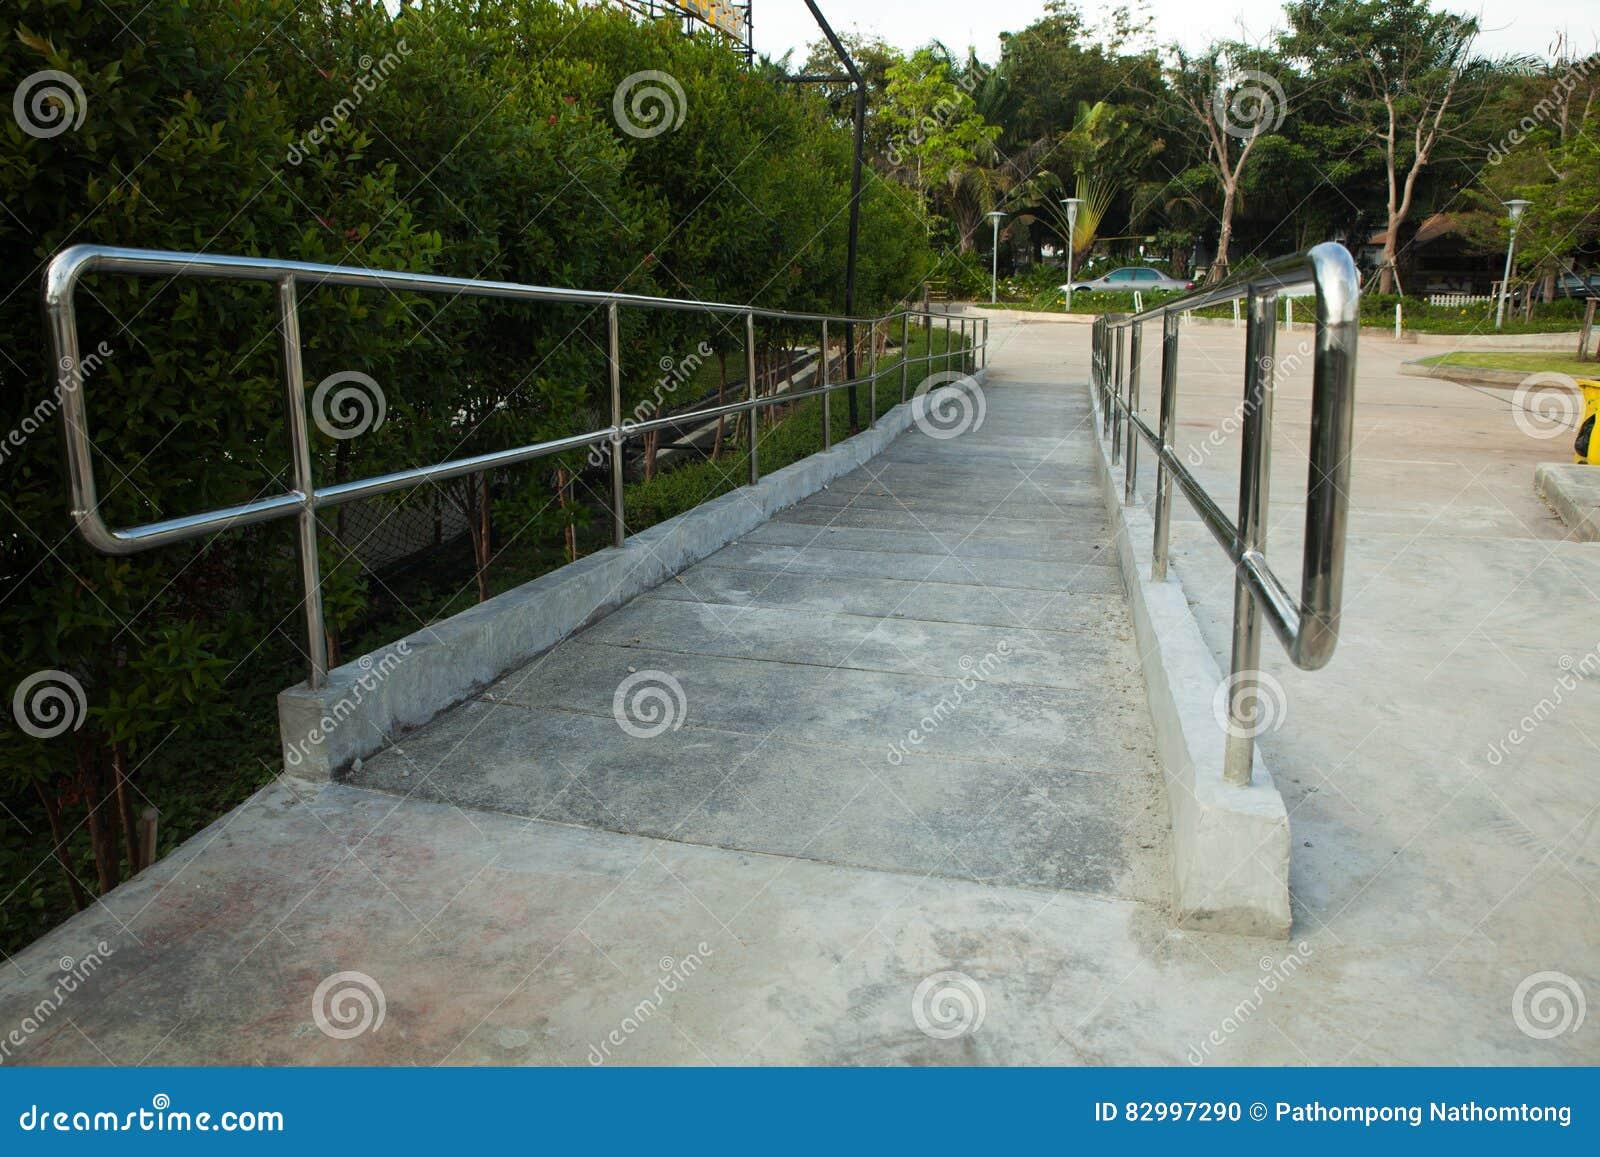 Outdoor Wheelchair Ramp